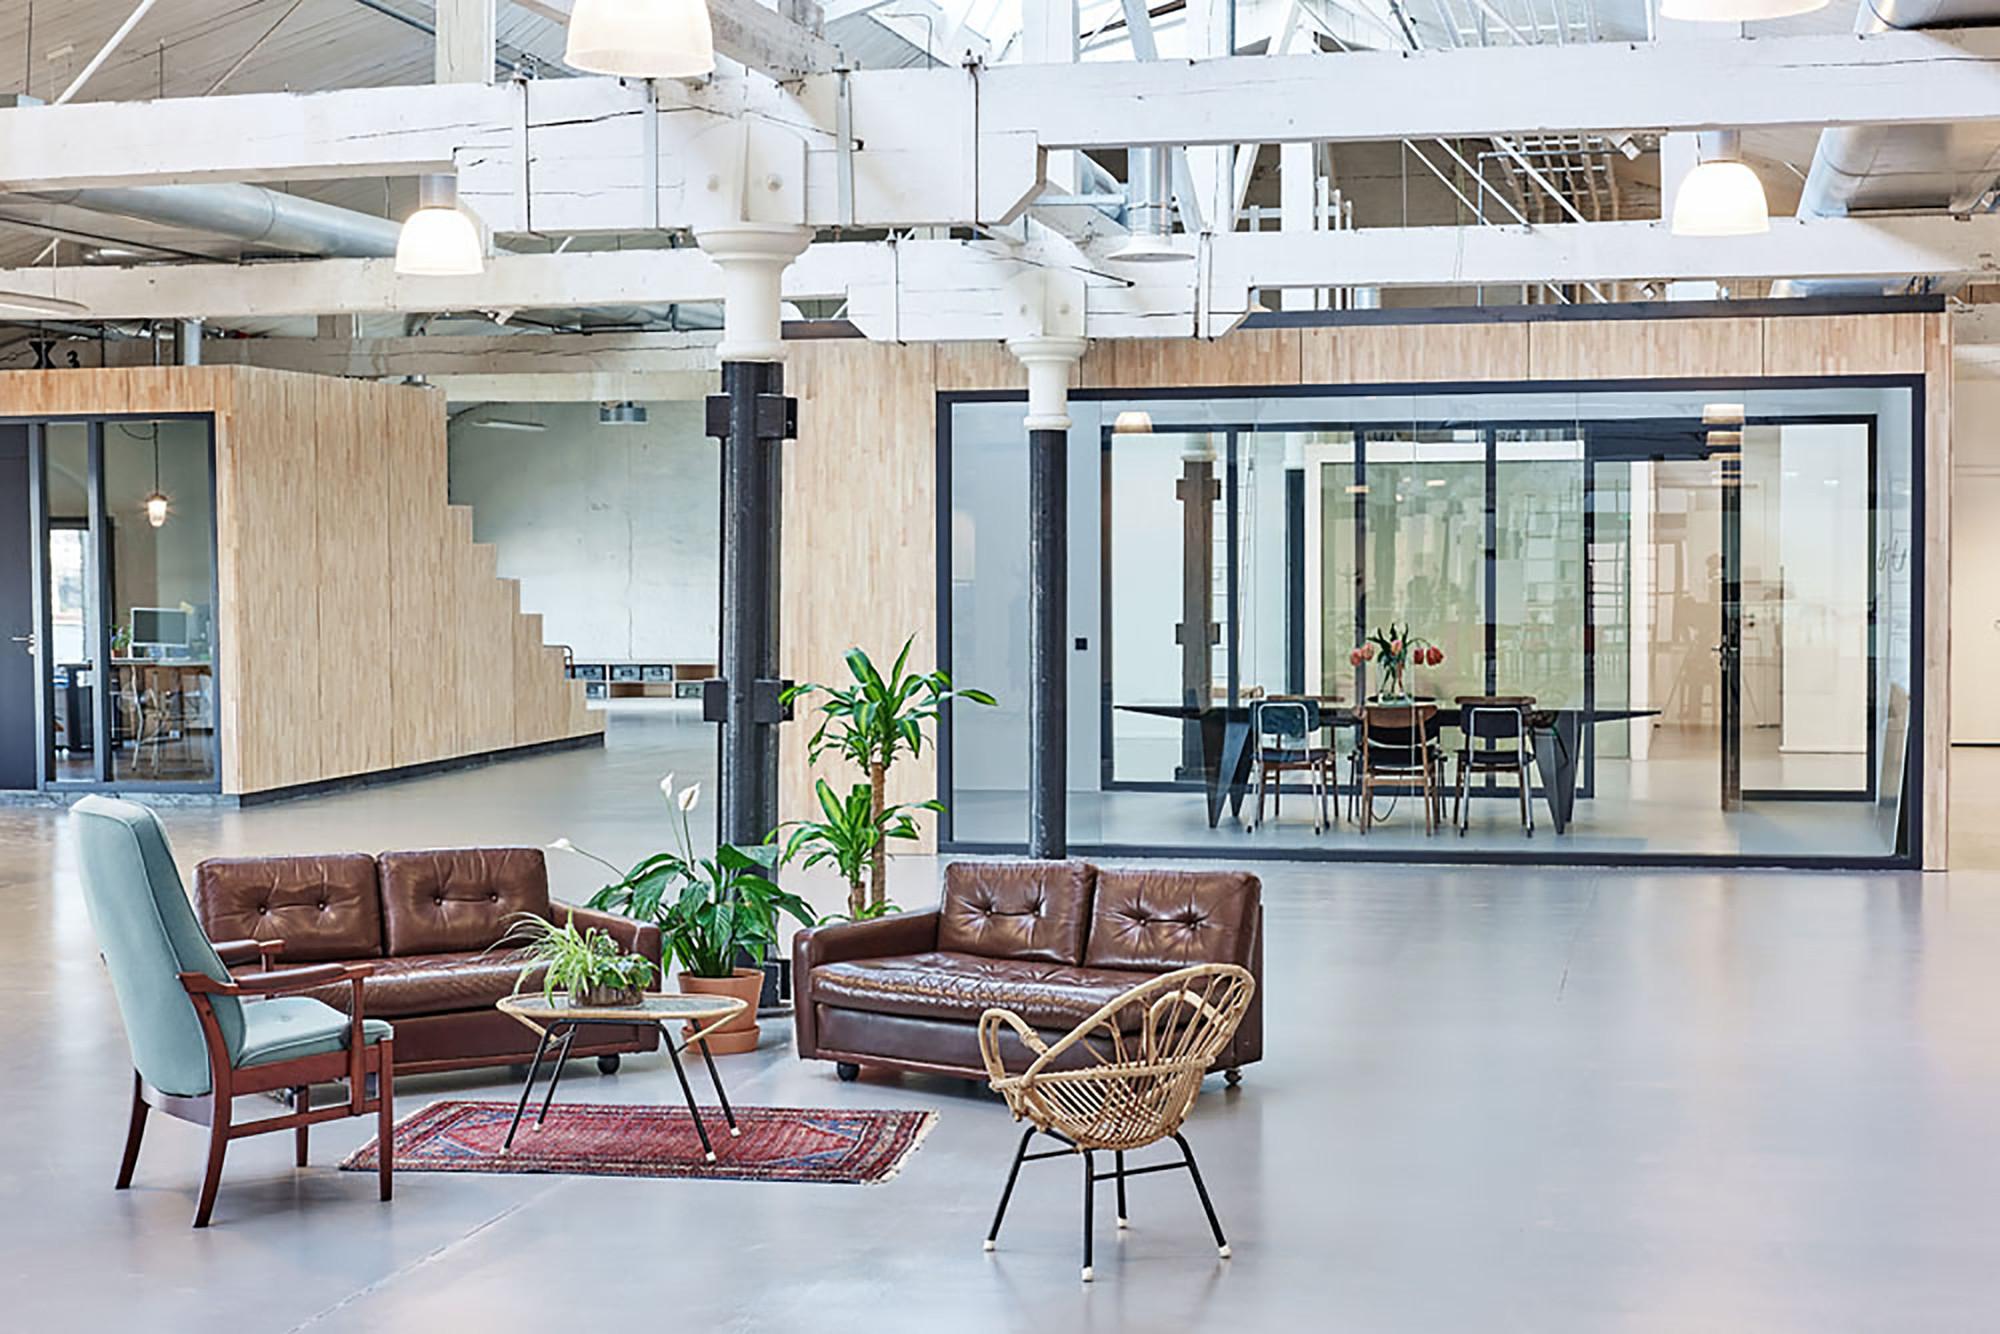 Gallery of fairphone head office in amsterdam melinda for Interior design amsterdam